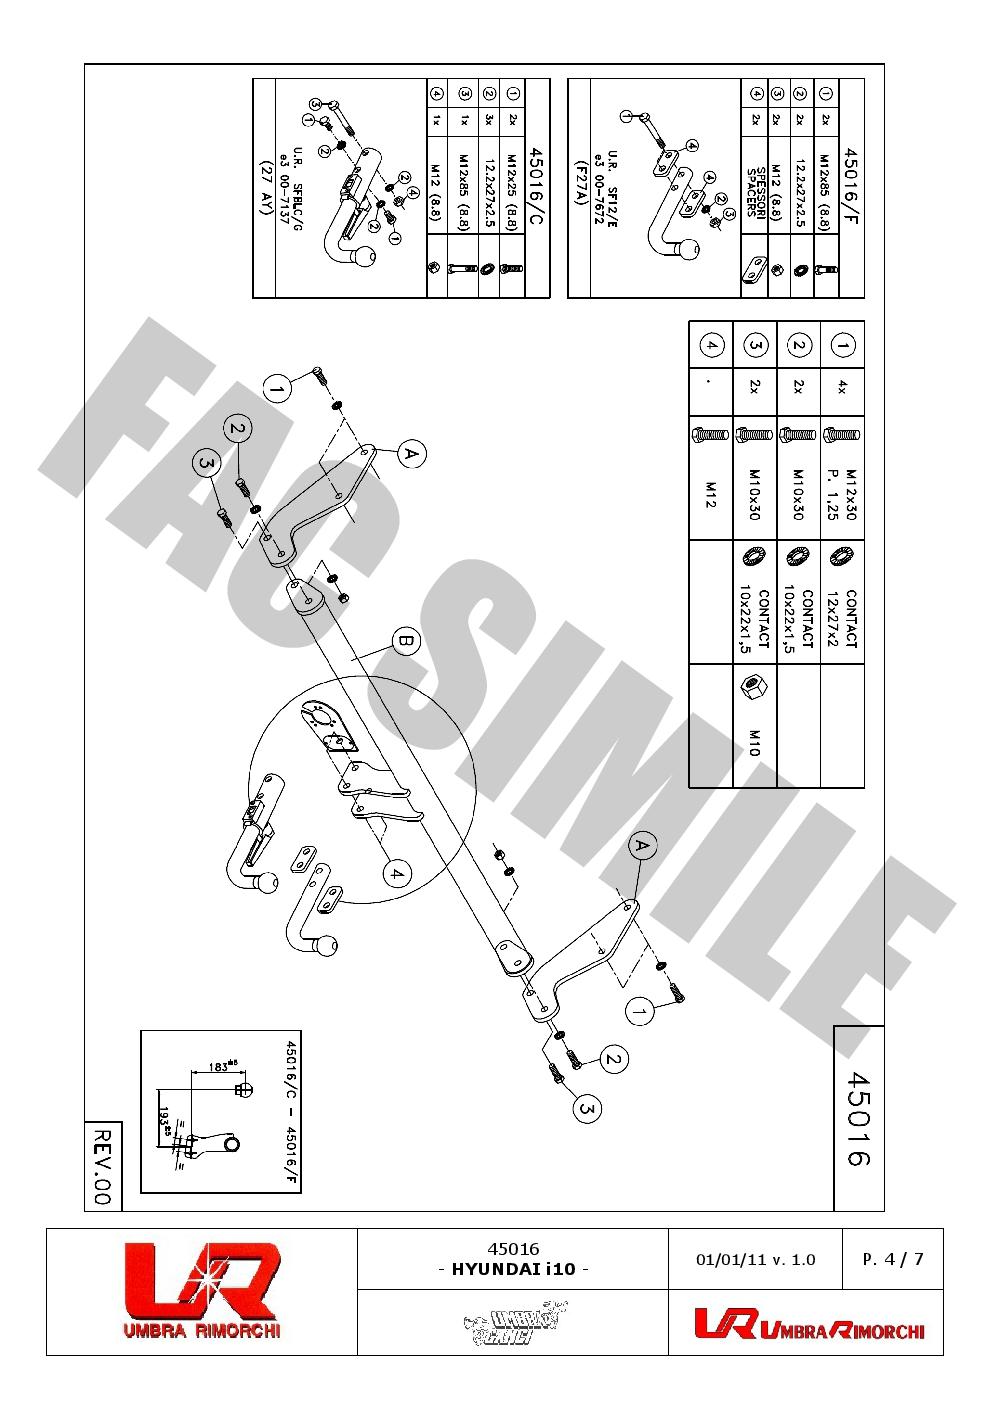 Awesome Wiring Diagram Hyundai I10 Basic Electronics Wiring Diagram Wiring Cloud Nuvitbieswglorg